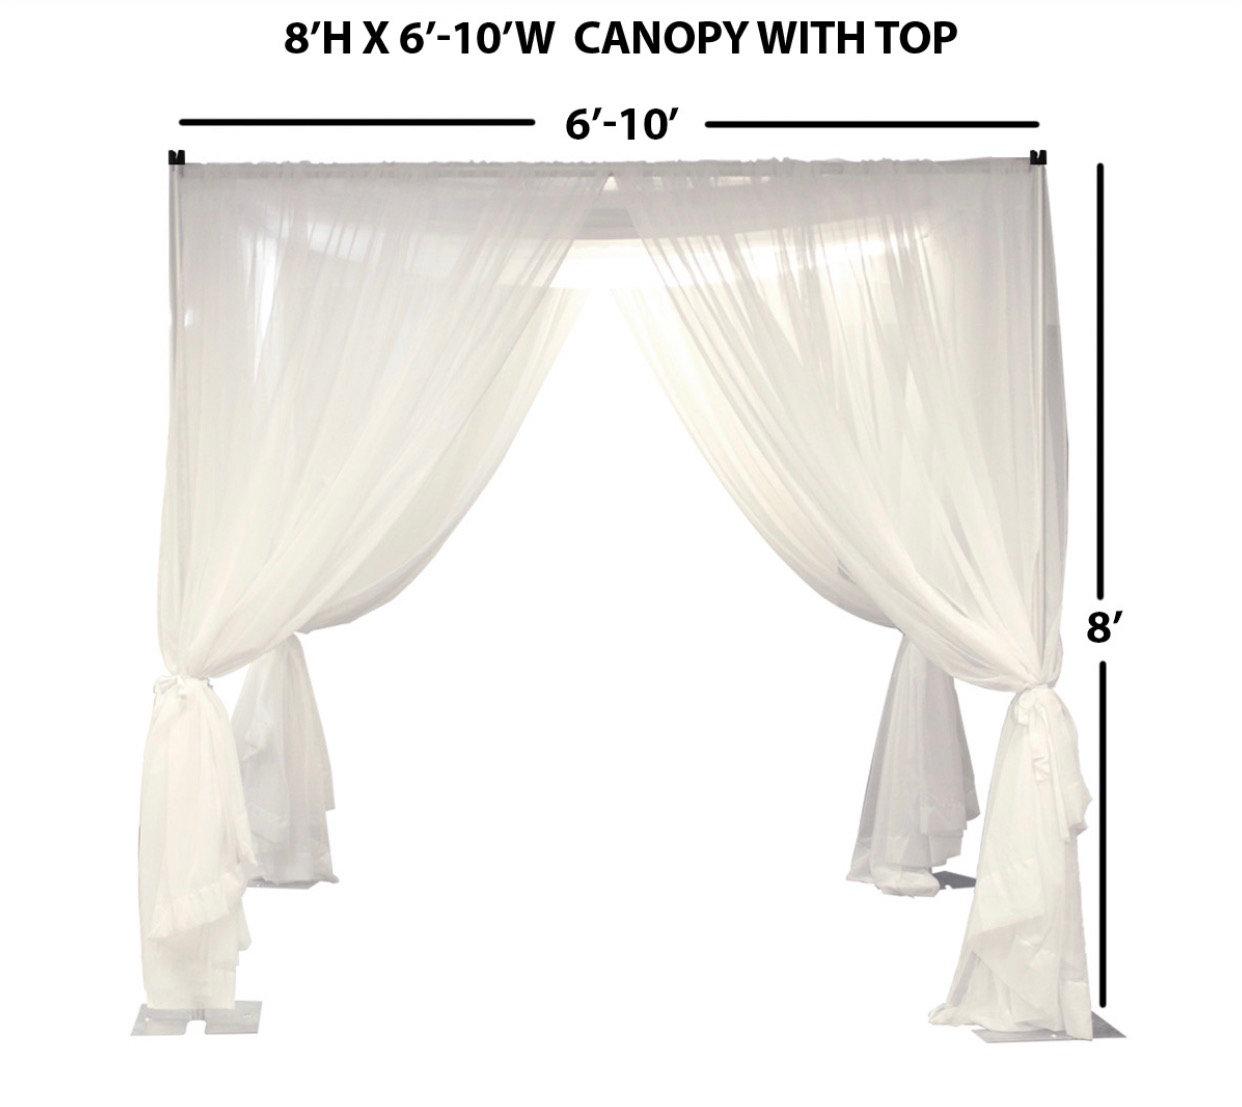 Canopy rental and Setup